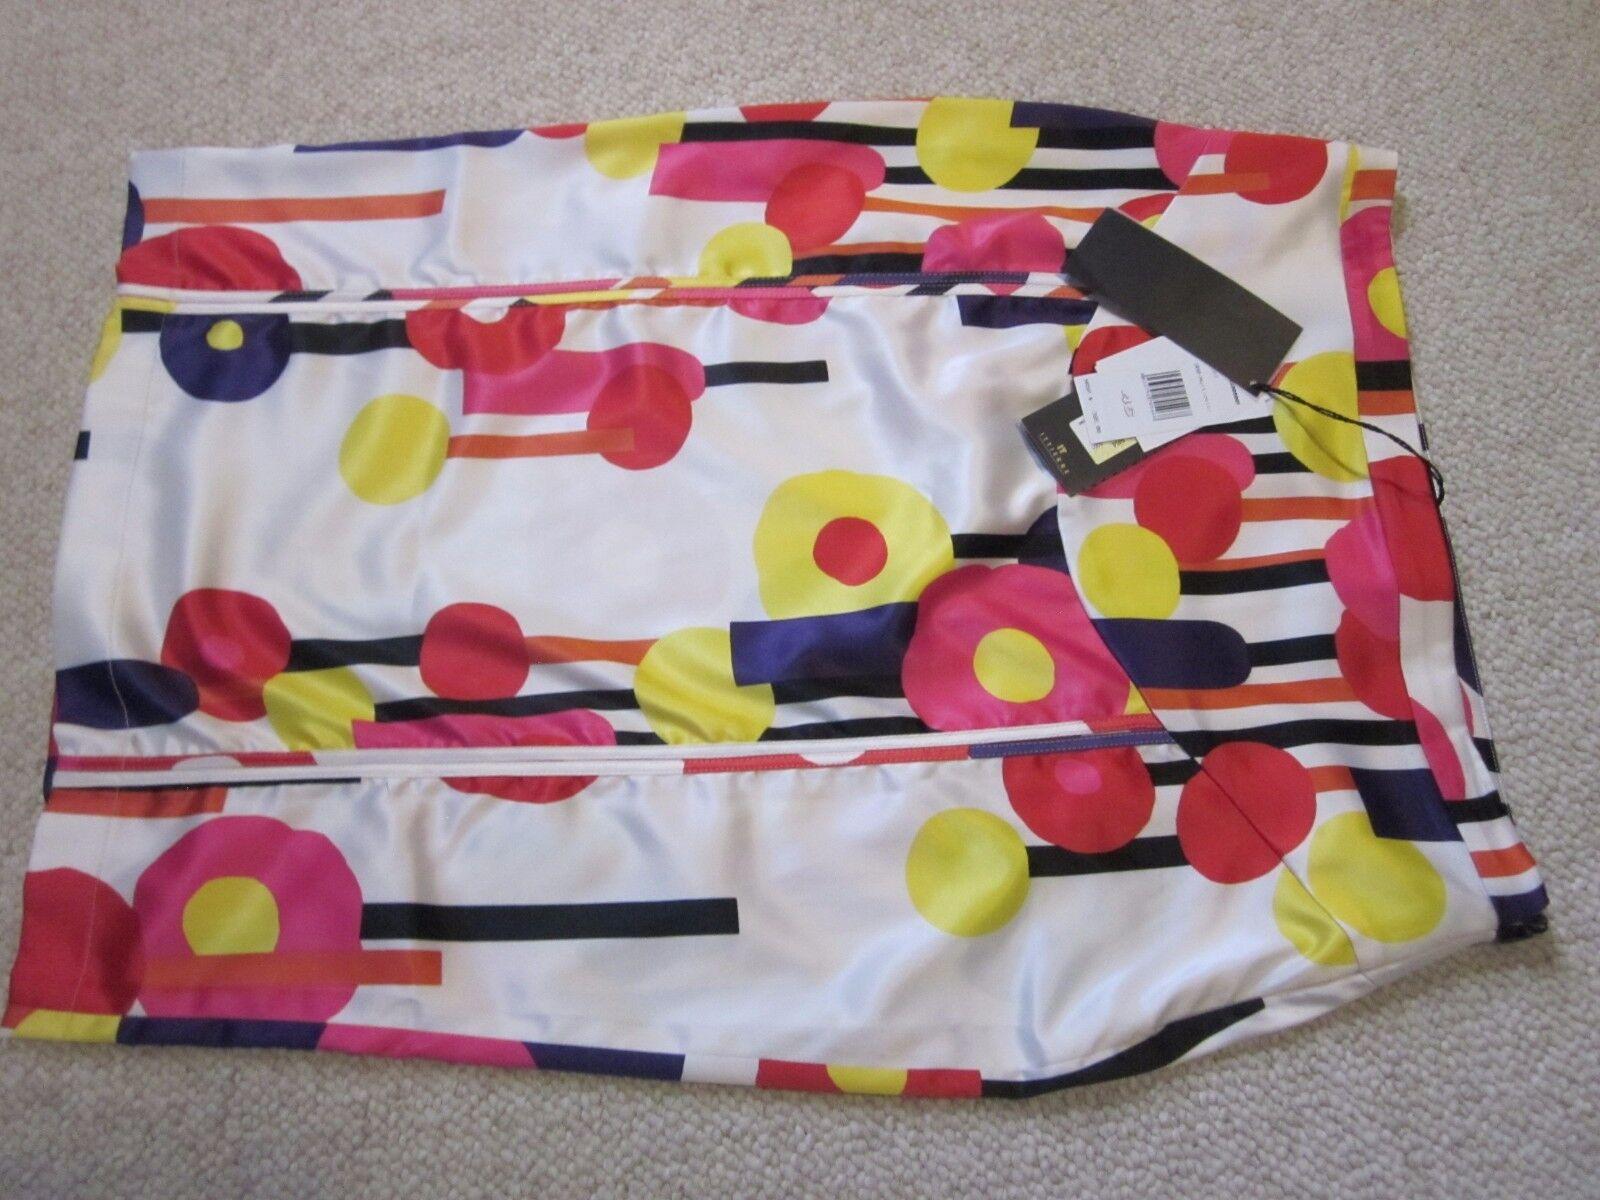 NWT Just Cavalli Multi color Print Skirt Size 46